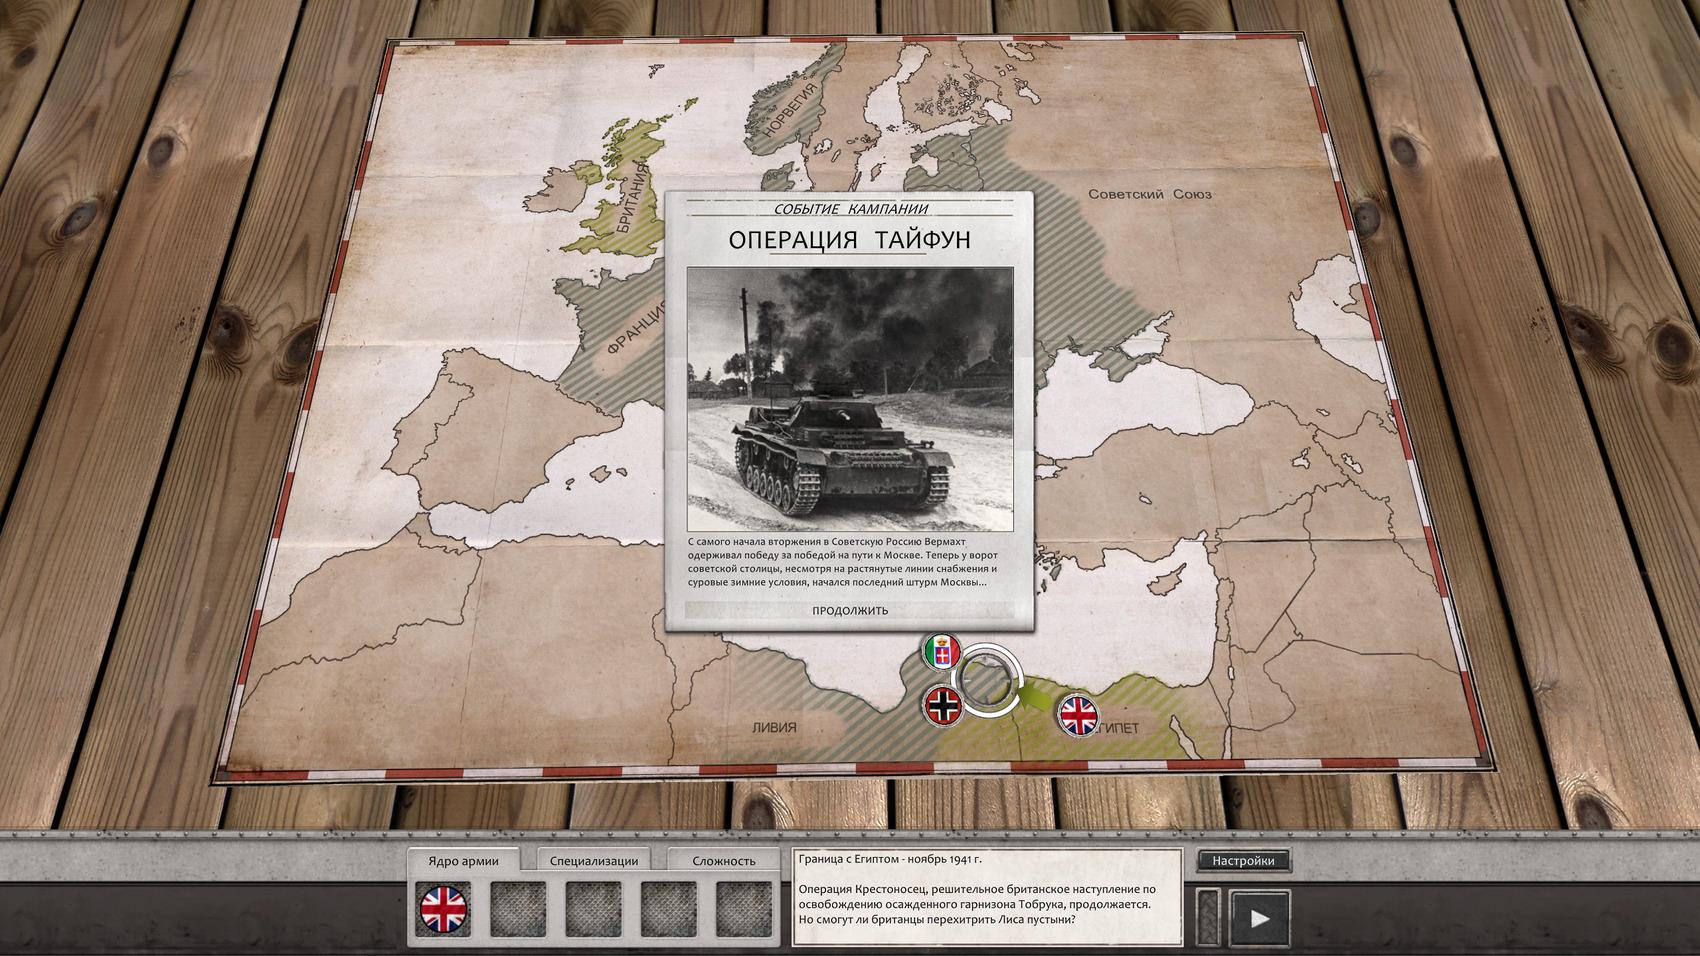 Allies Defiant